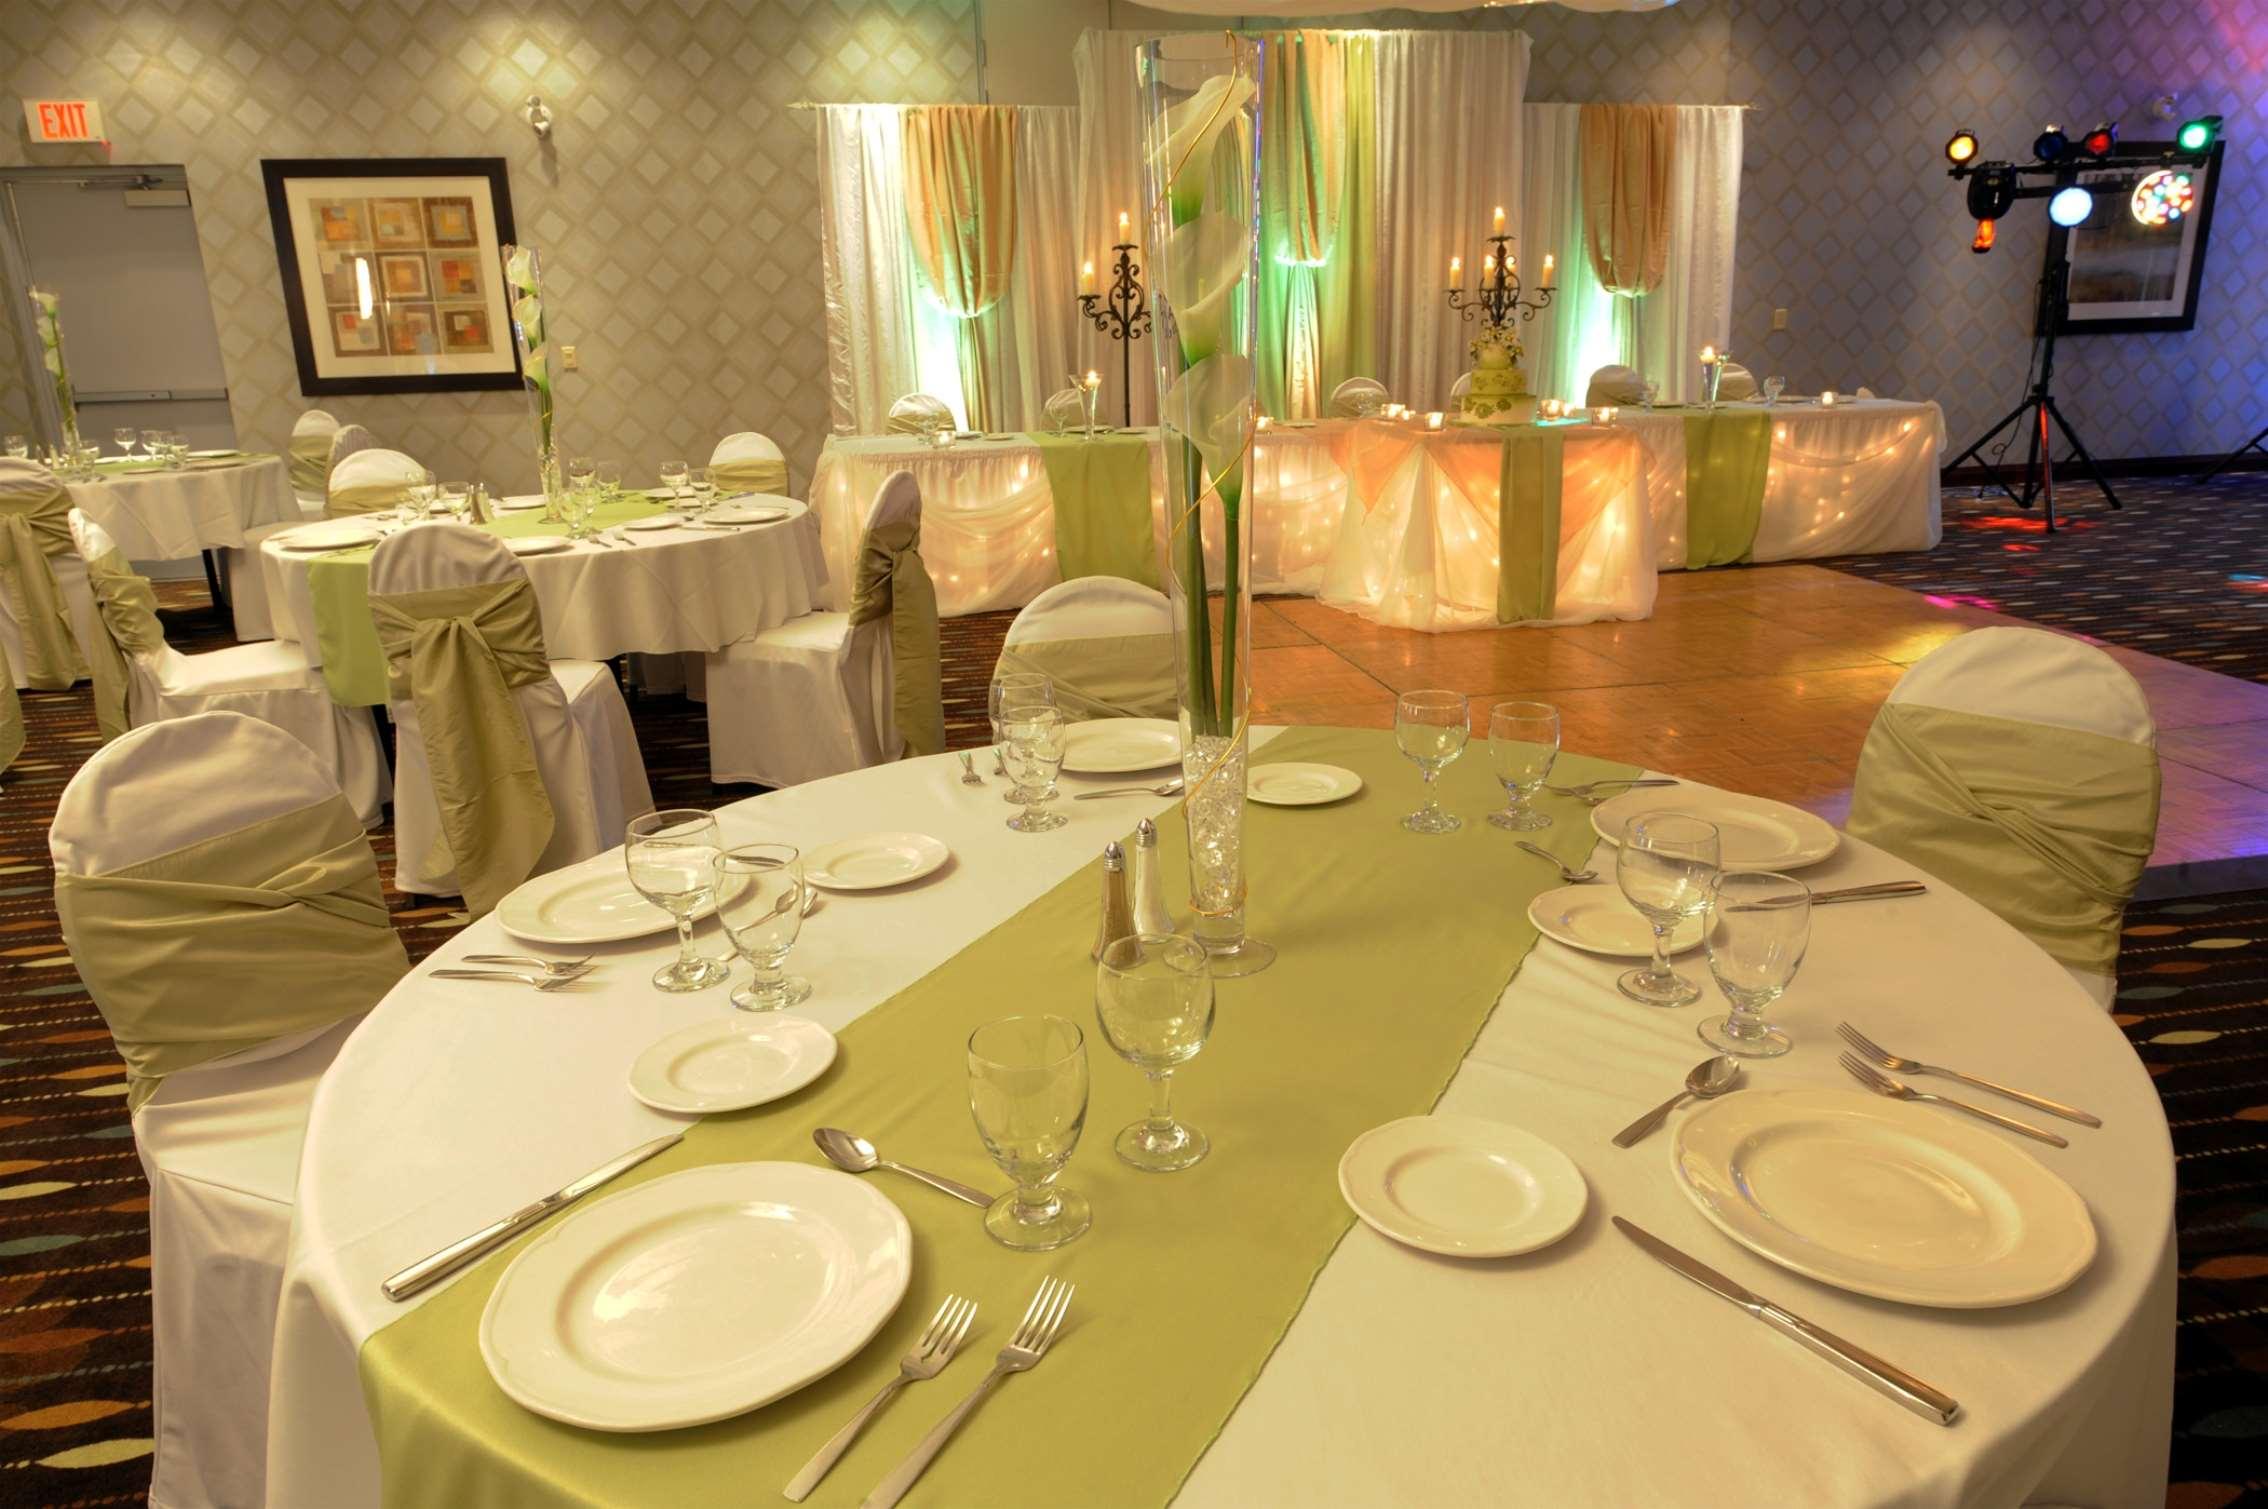 Hampton Inn & Suites by Hilton Brantford, Ontario